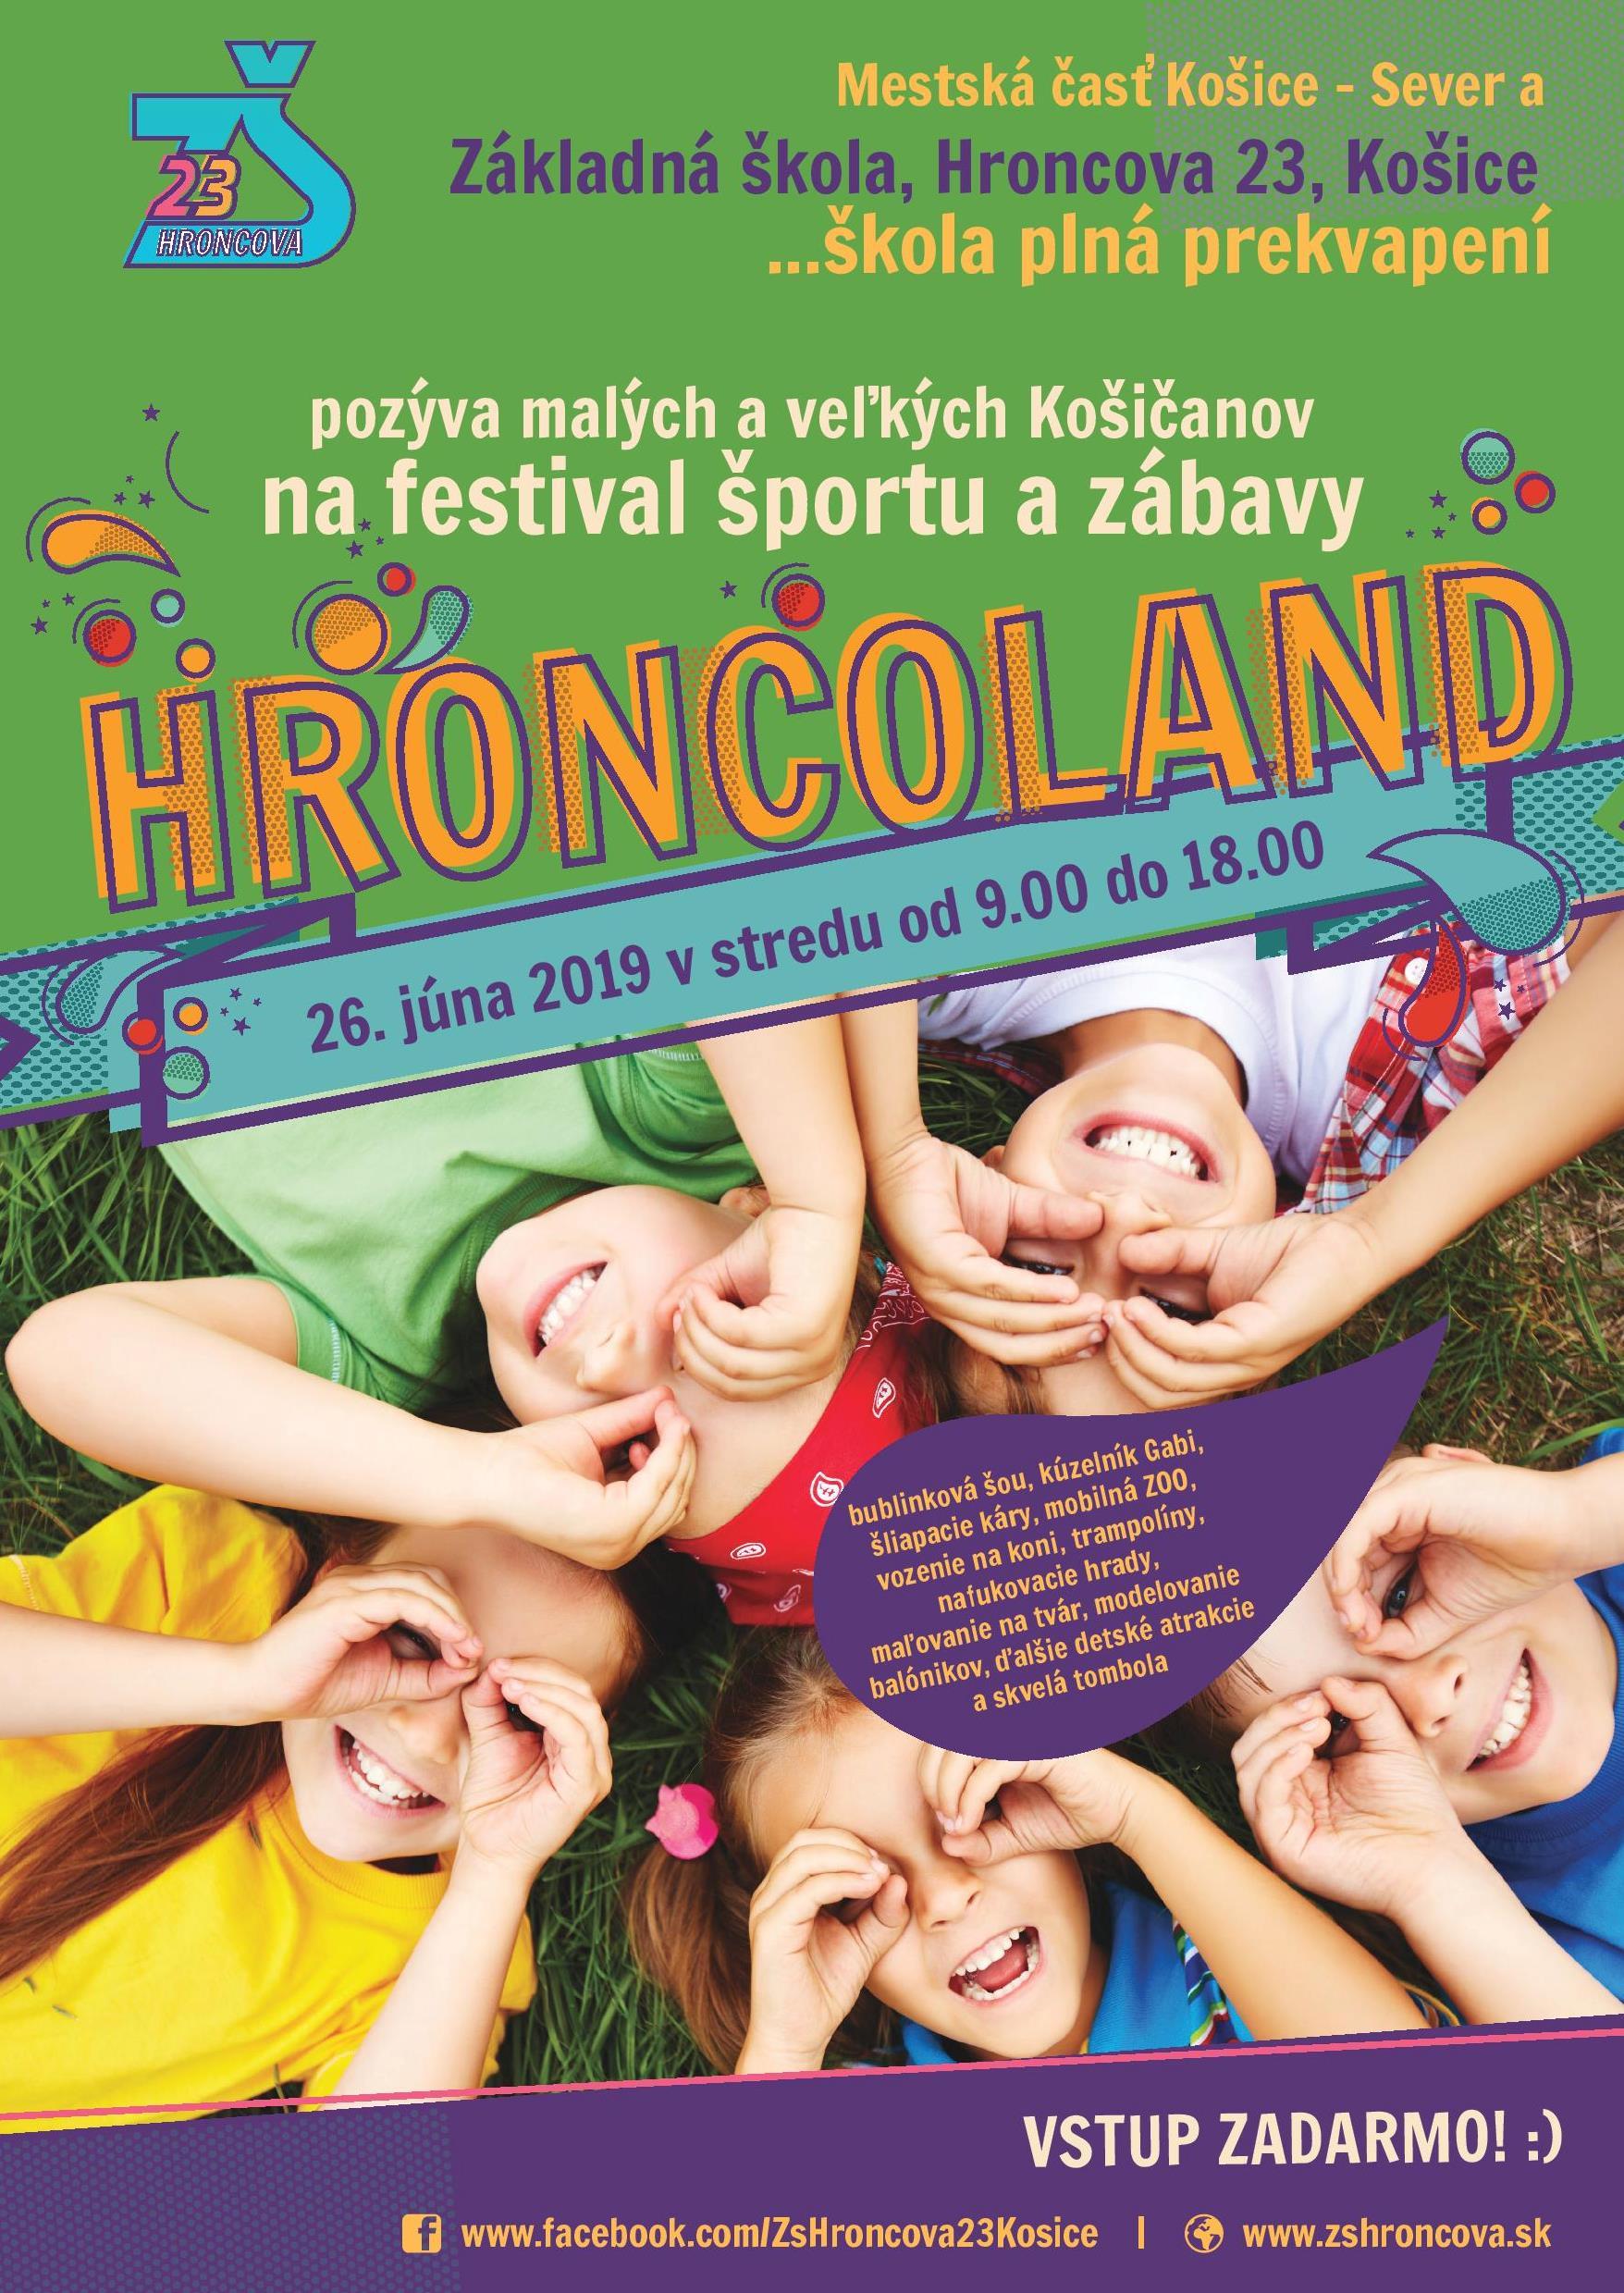 Hroncoland 2019